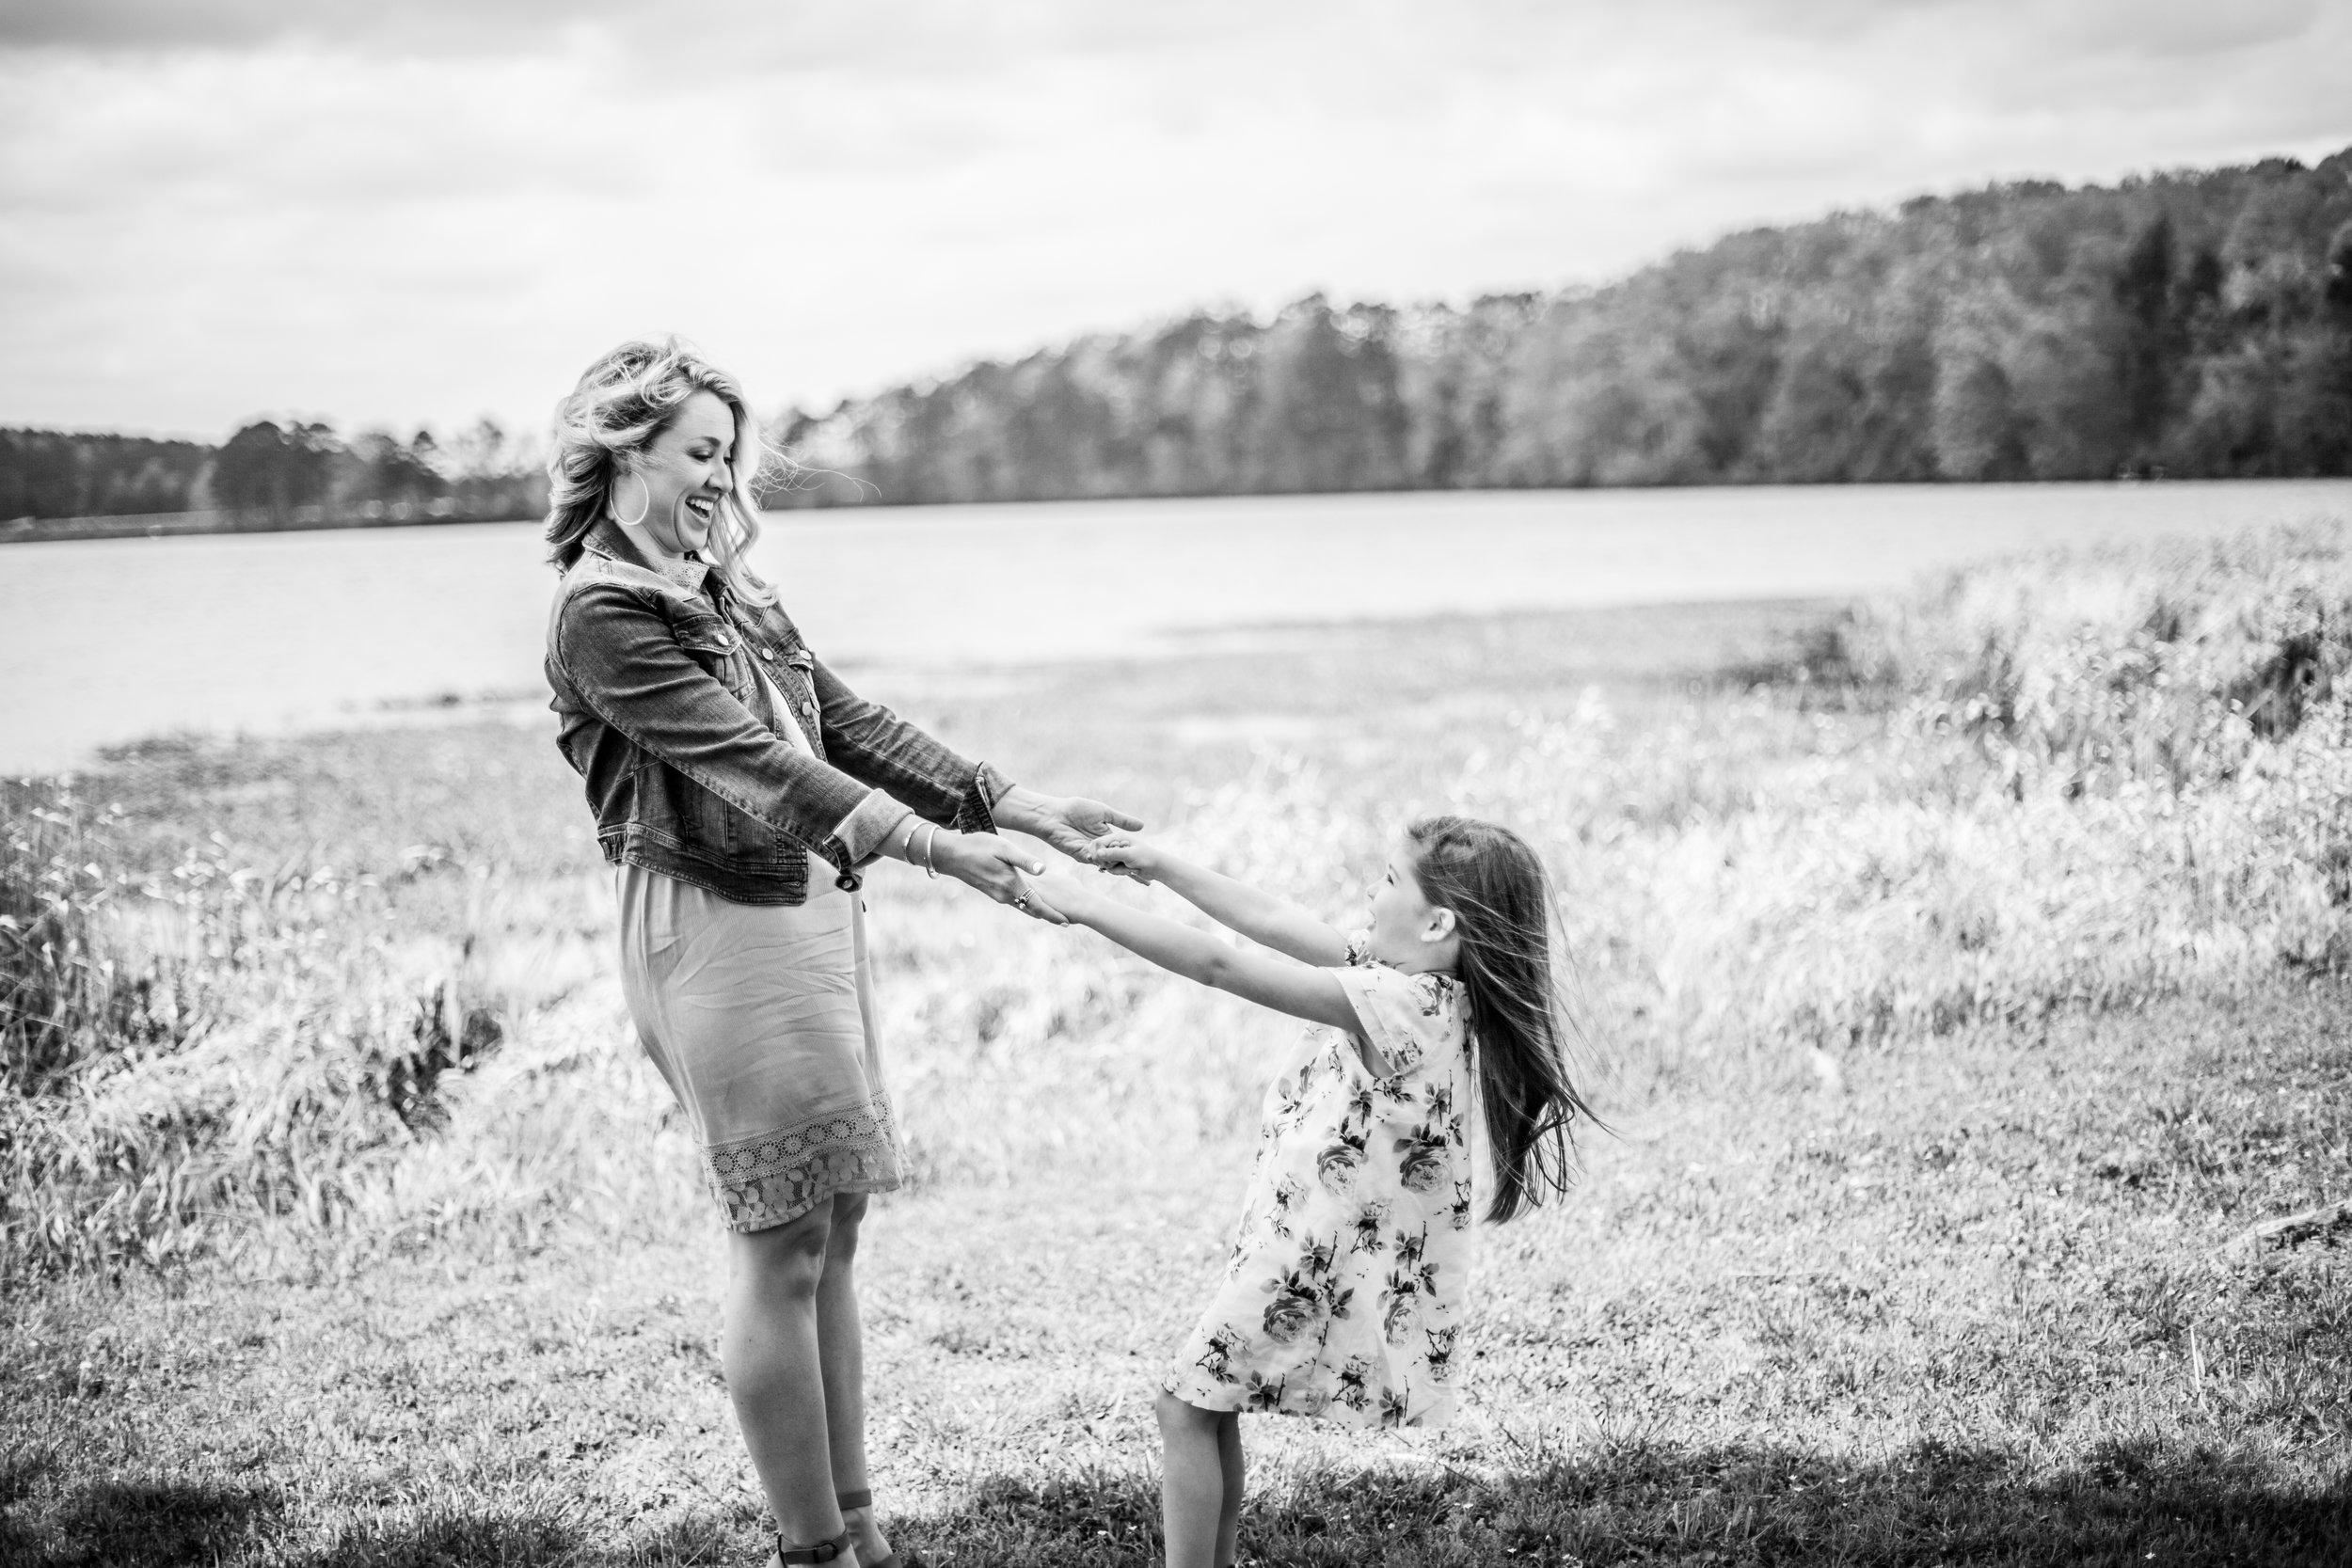 woodstock-family-photography-mini-session-acworth-beach-35.jpg